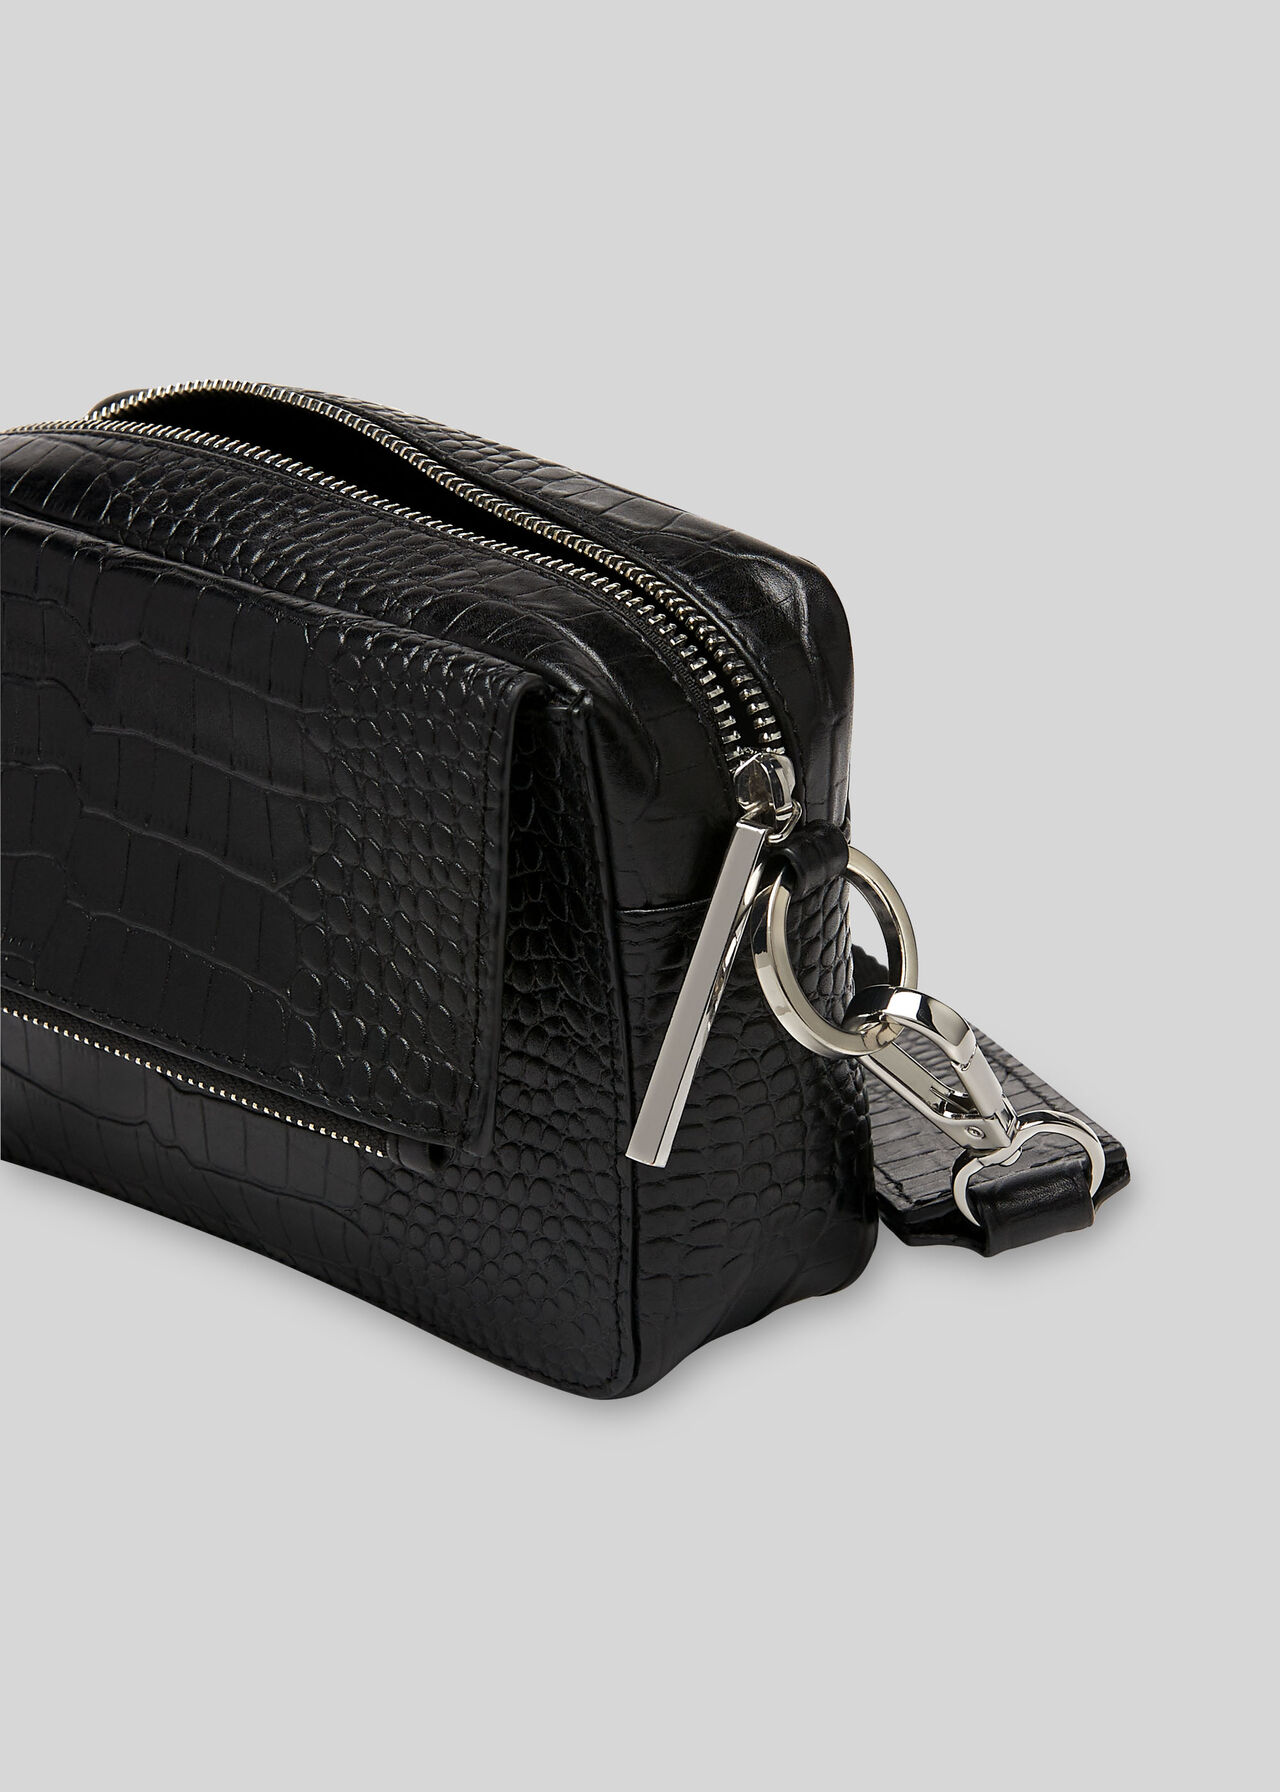 Millie Croc Crossbody Bag Black